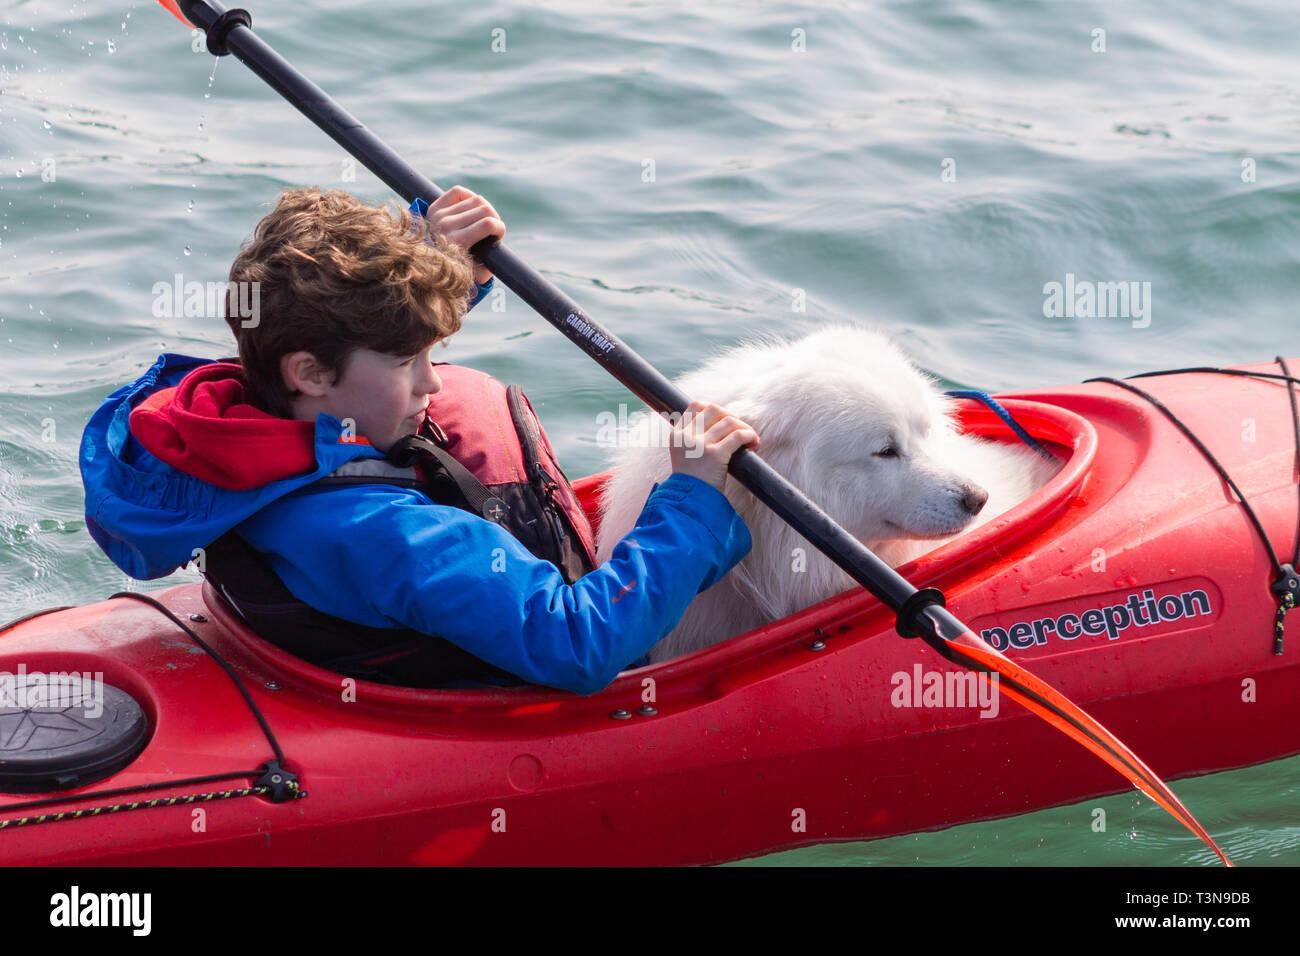 boy-and-his-pet-dog-kayaking-or-canoeing-T3N9DB.jpg